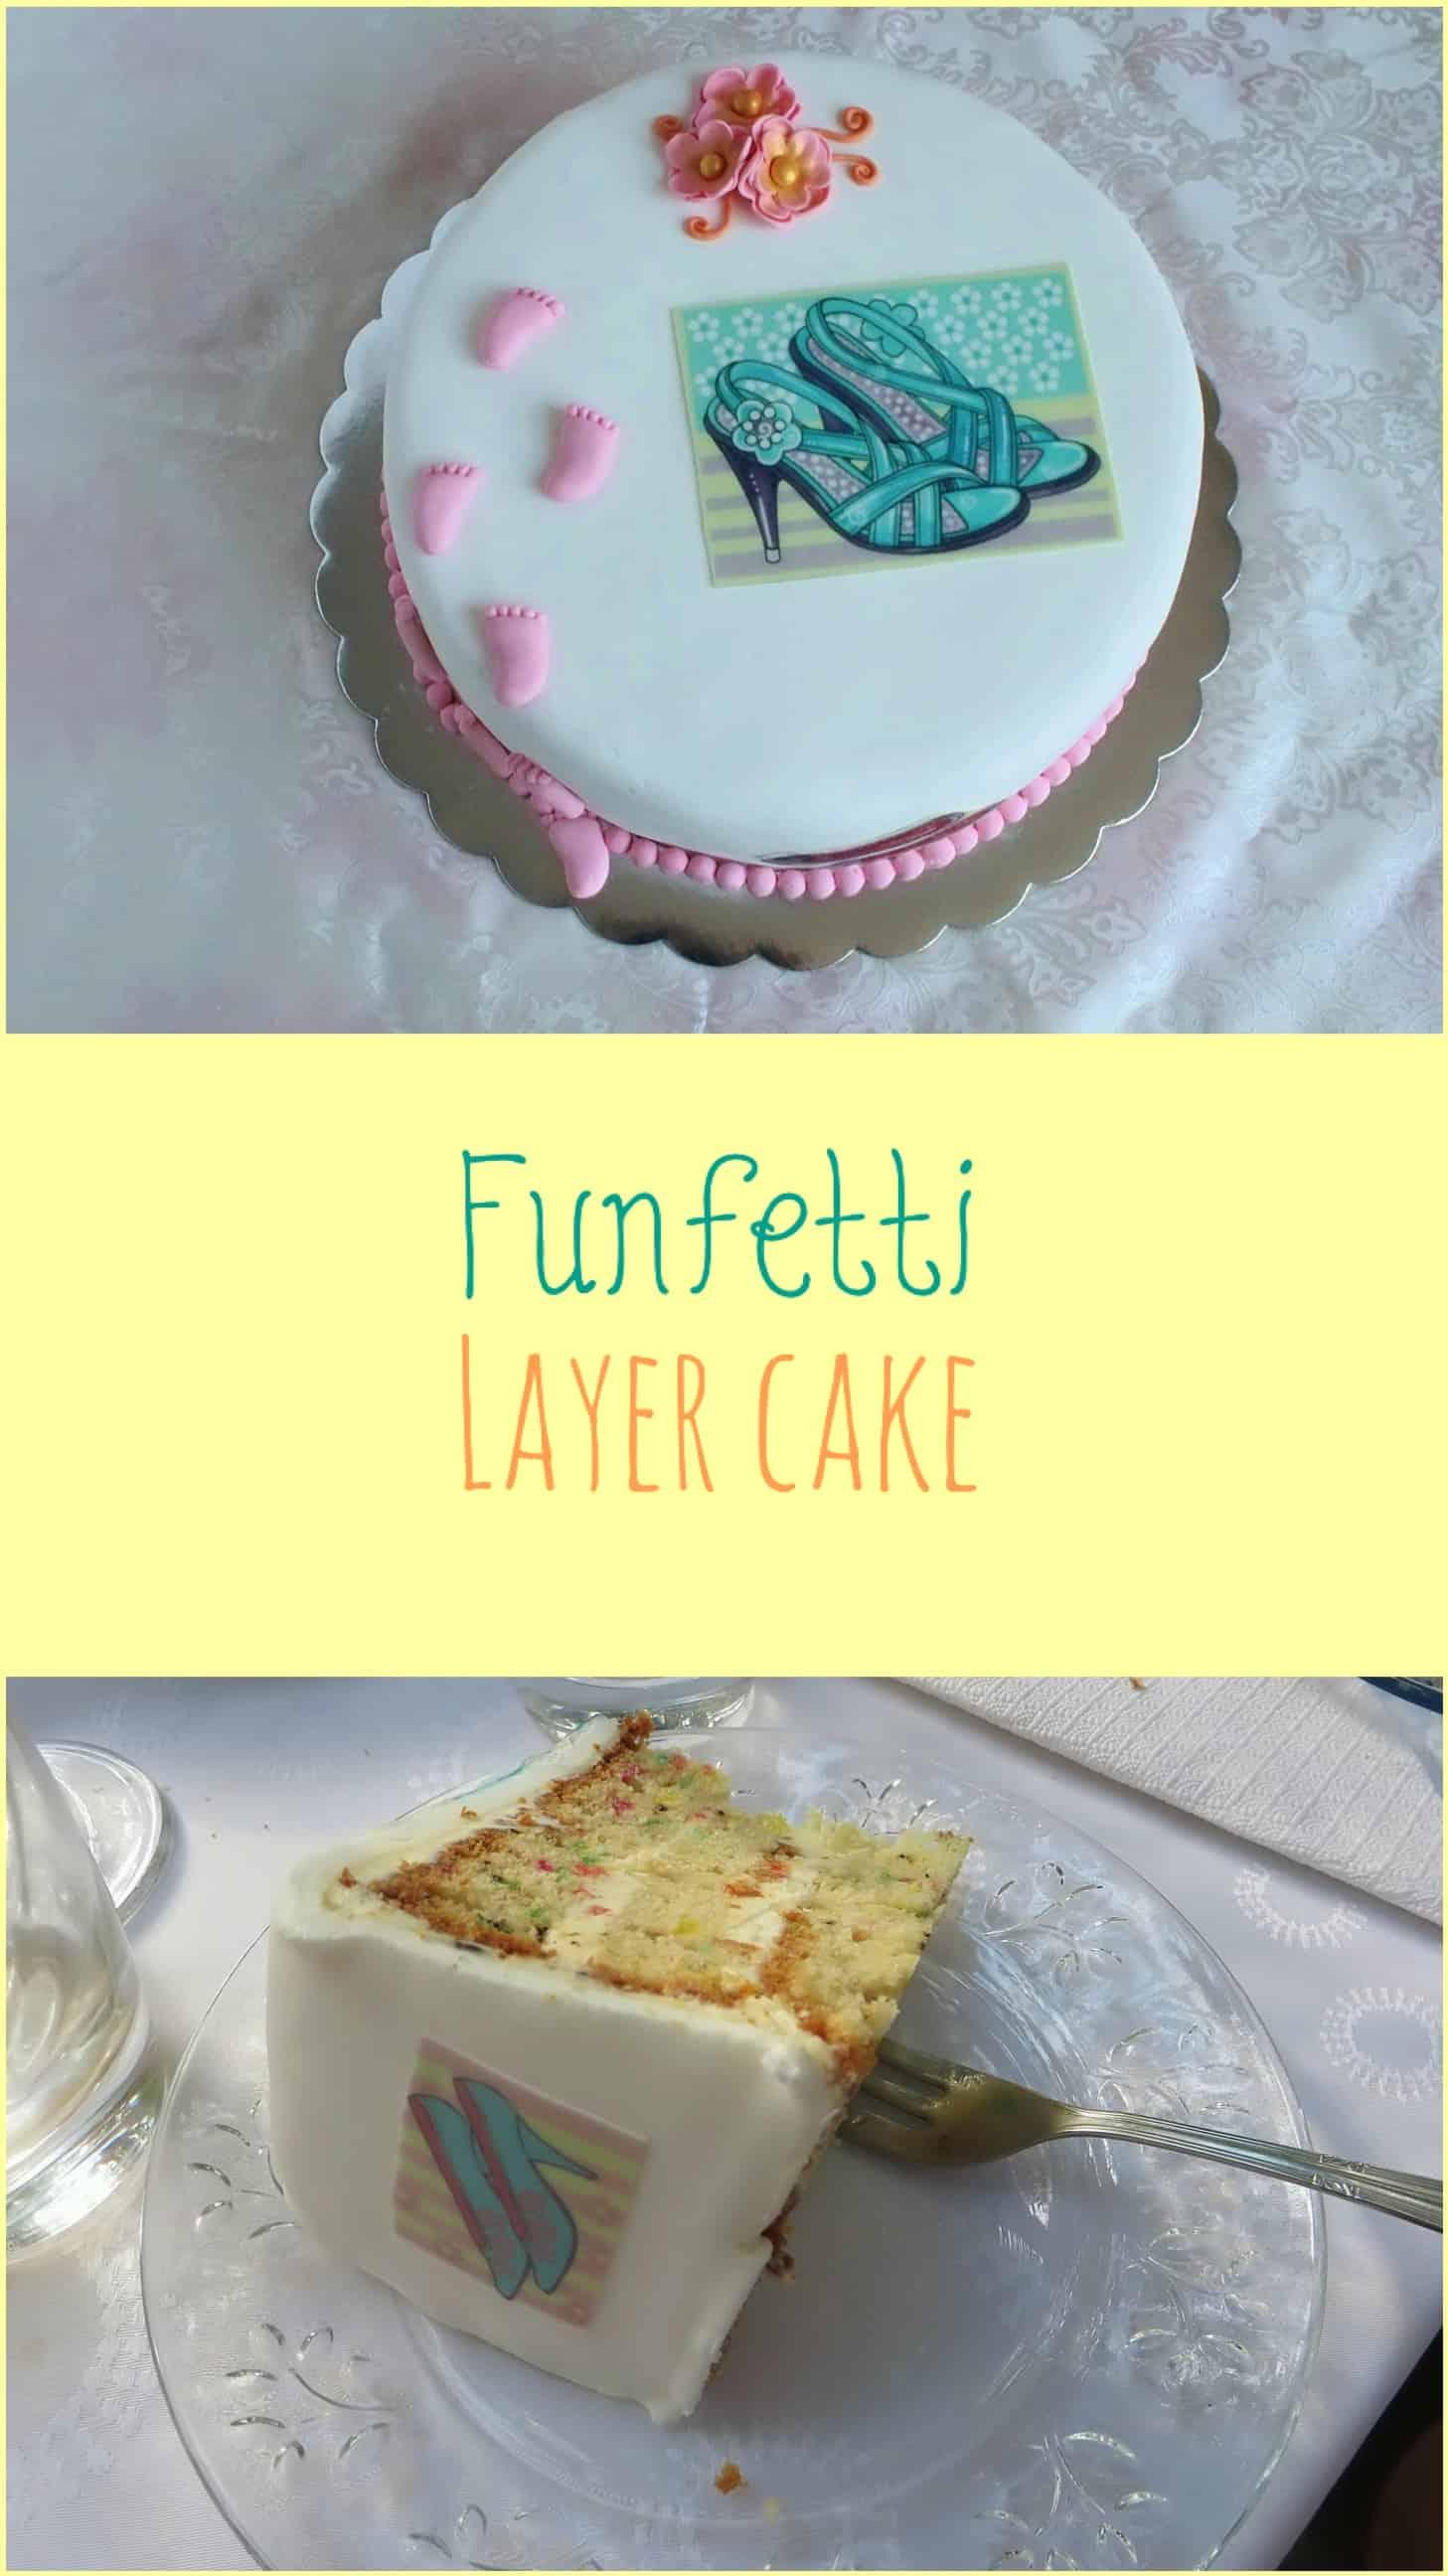 Funfetti Layer Cake - daniscookings.wordpress.com